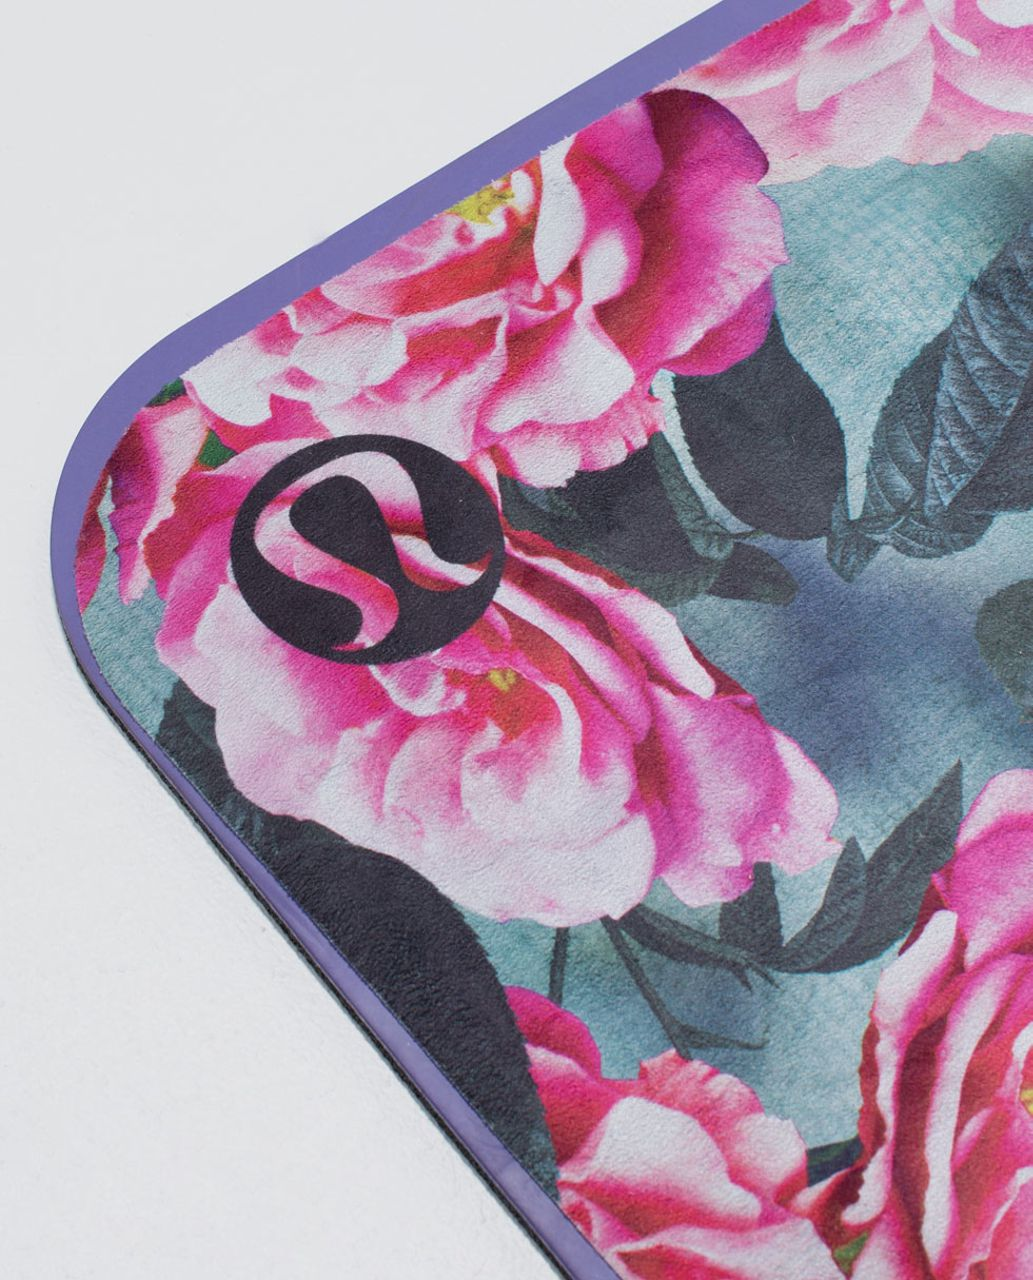 Lululemon The Towel *Printed - Jumbo Secret Garden Multi